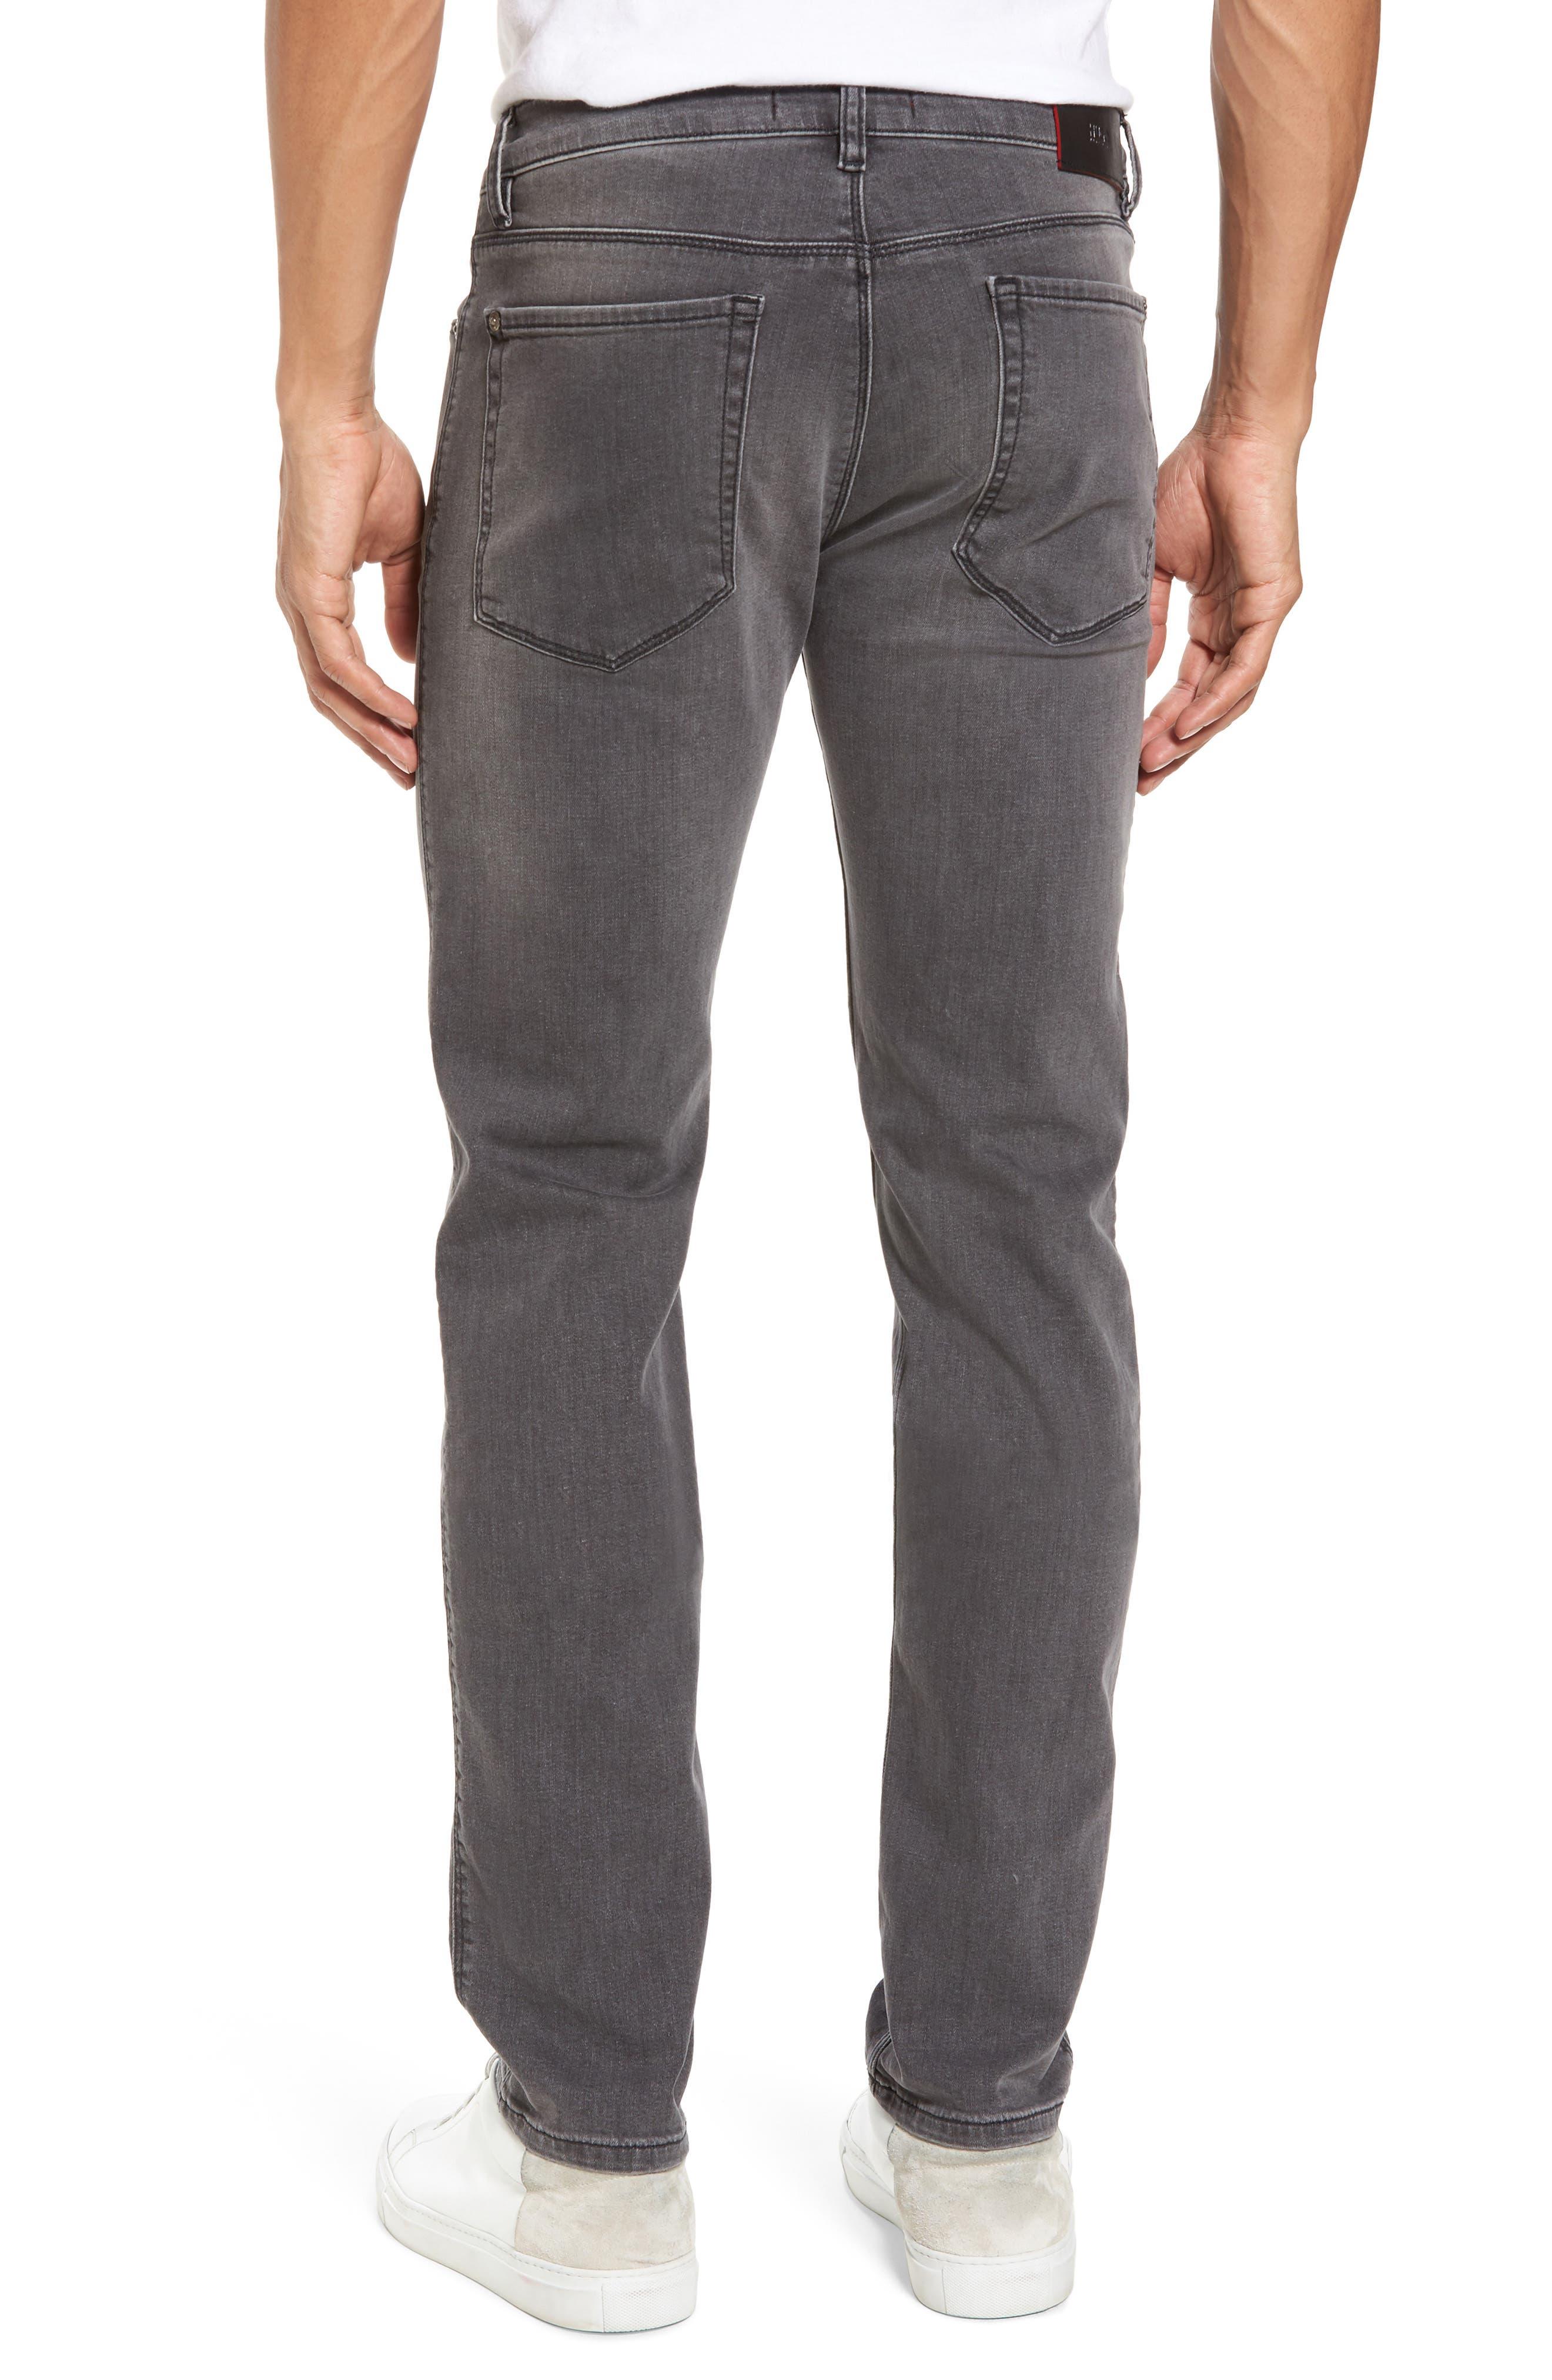 Hugo Boss 708 Stonewash Denim Jeans,                             Alternate thumbnail 2, color,                             021